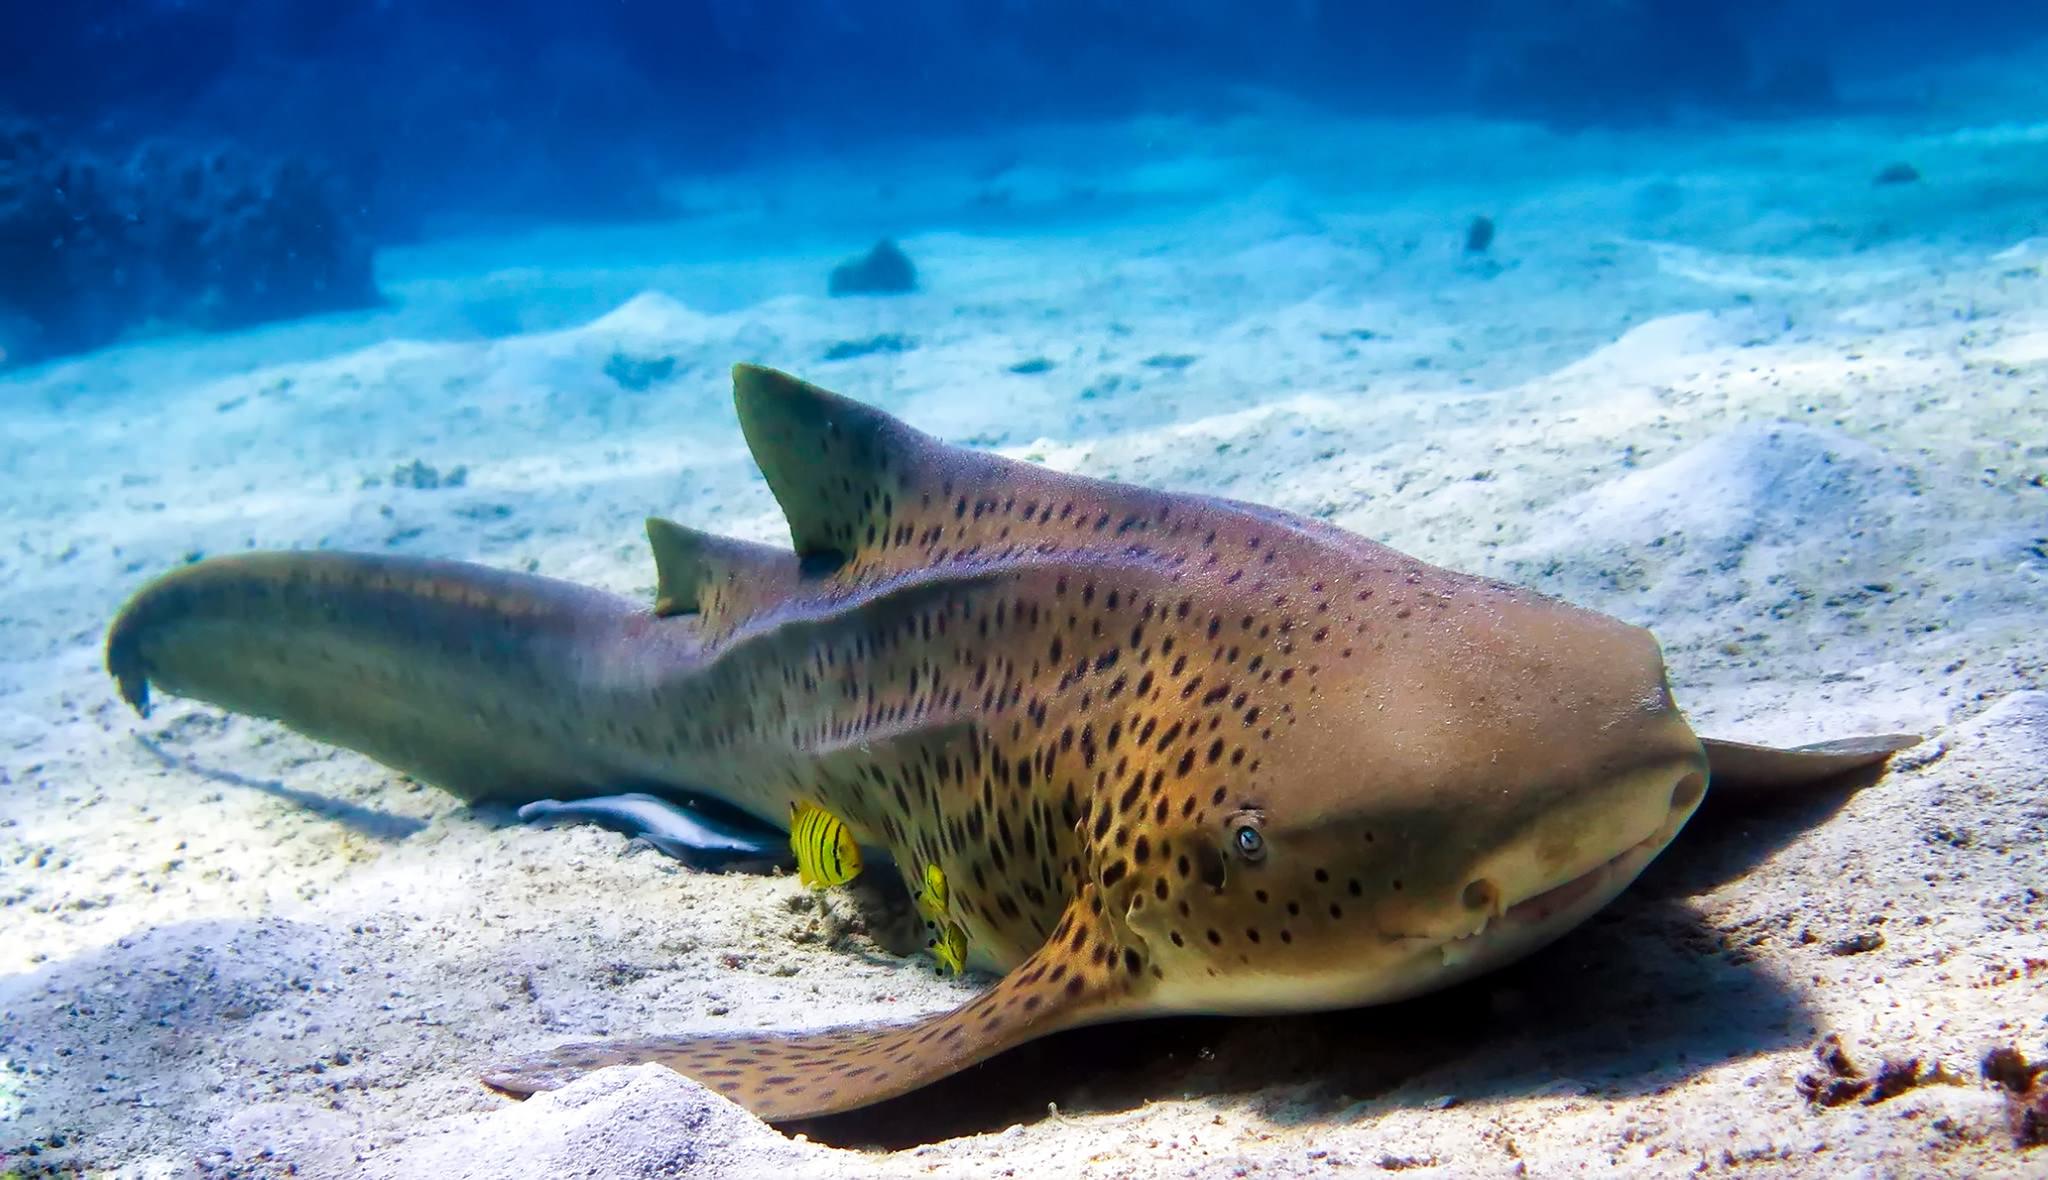 animaux sous-marins plongée madagascar